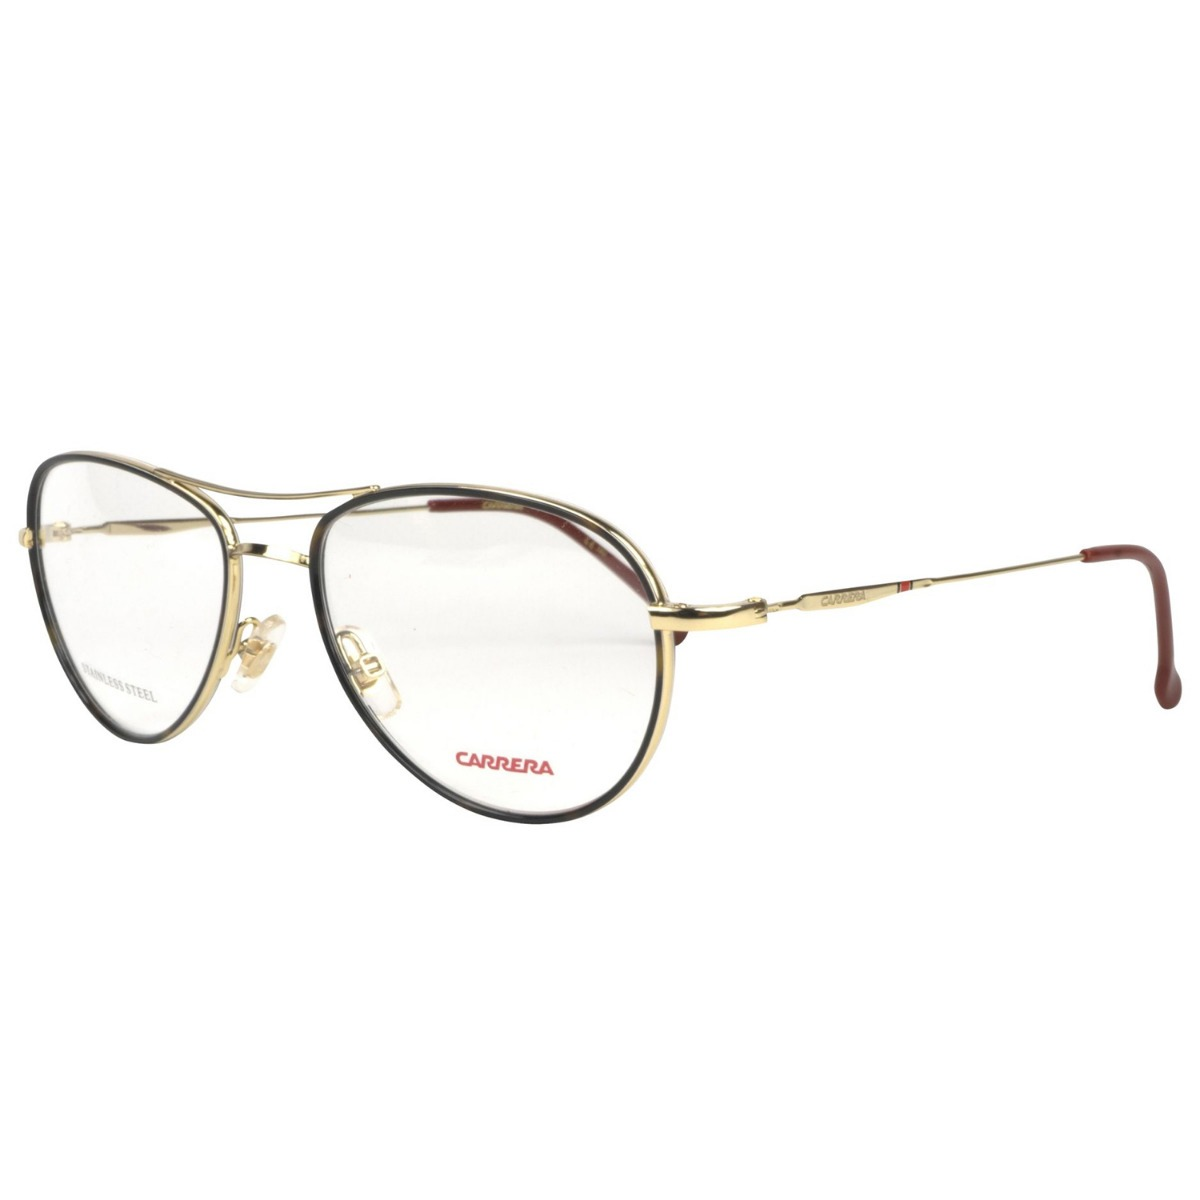 683574b6a5 lentes de vista oftalmicos carrera 169/v originales piloto. Cargando zoom.